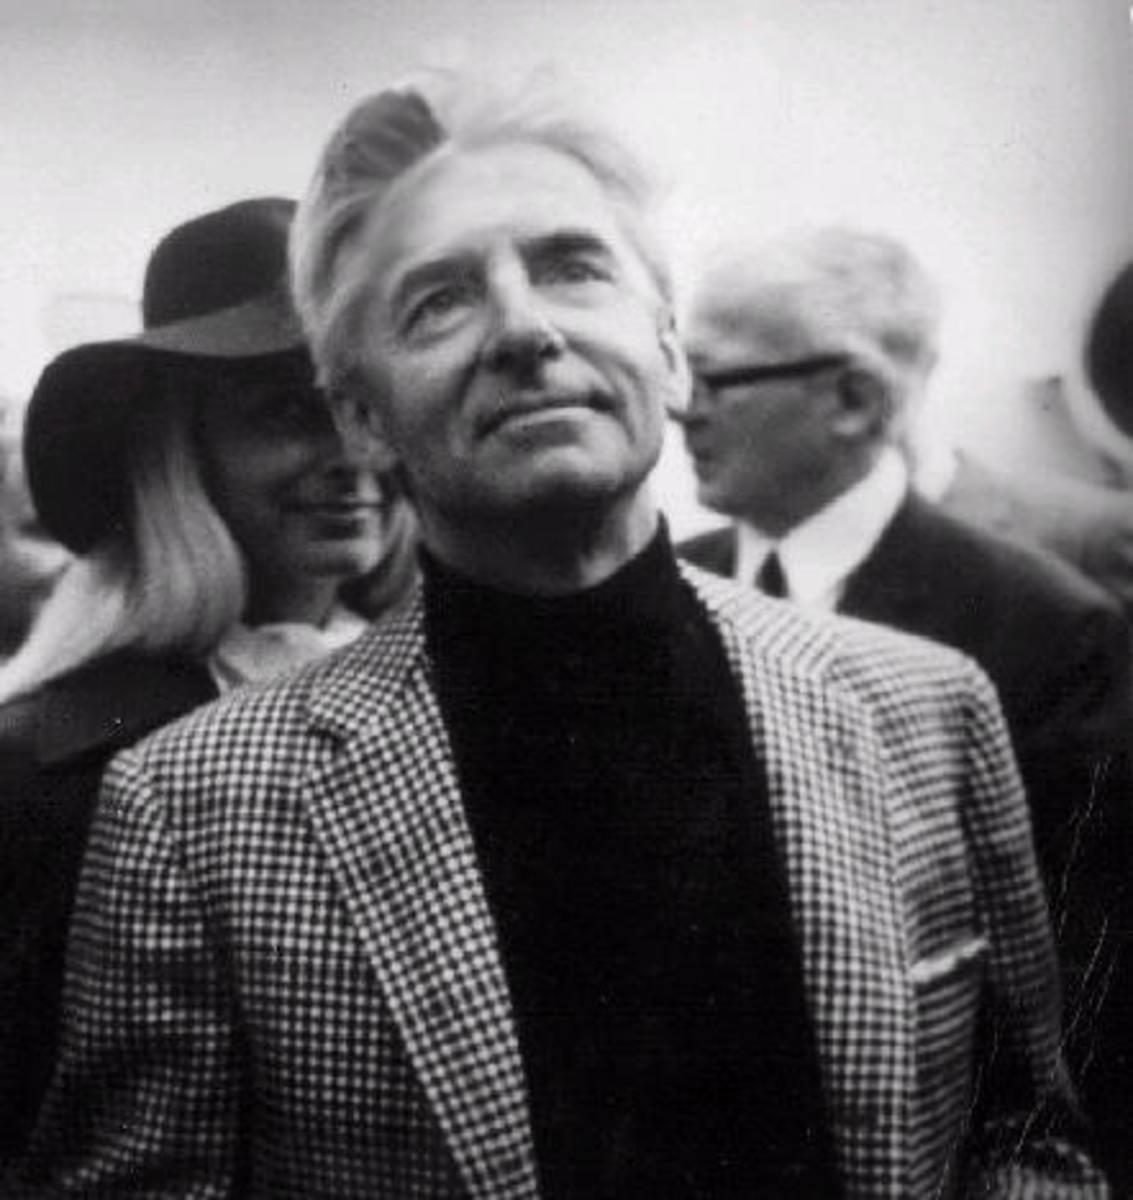 Karajan without a tie, exceedingly elegant regardless. Credit: unforgettablesolitude.wordpress.com